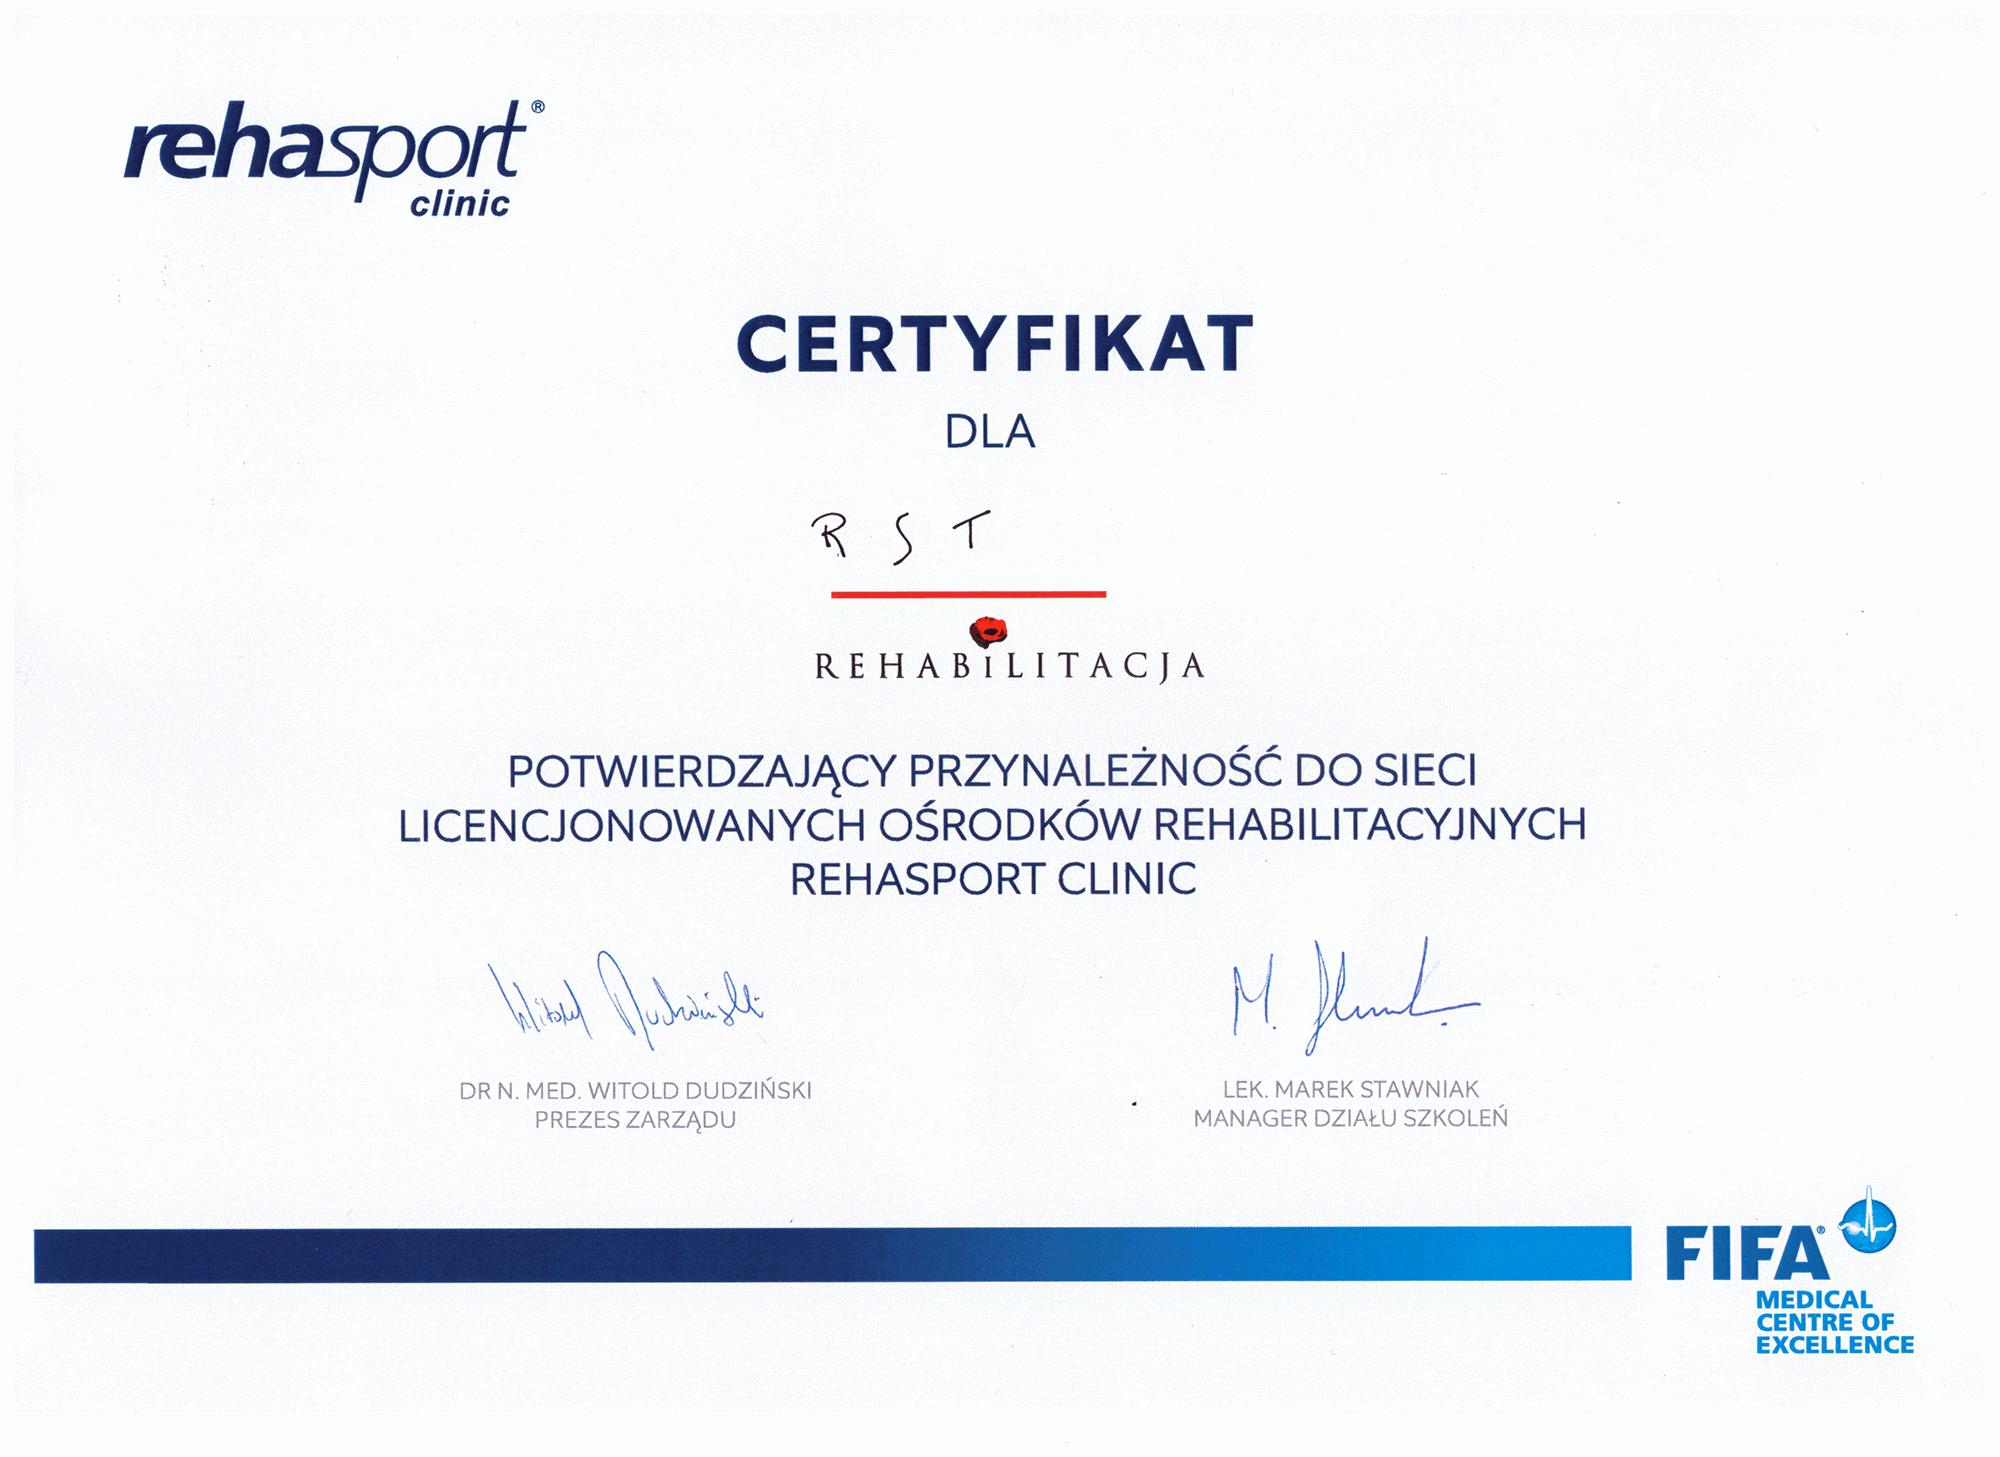 Certyfikat Rehasport Clinic